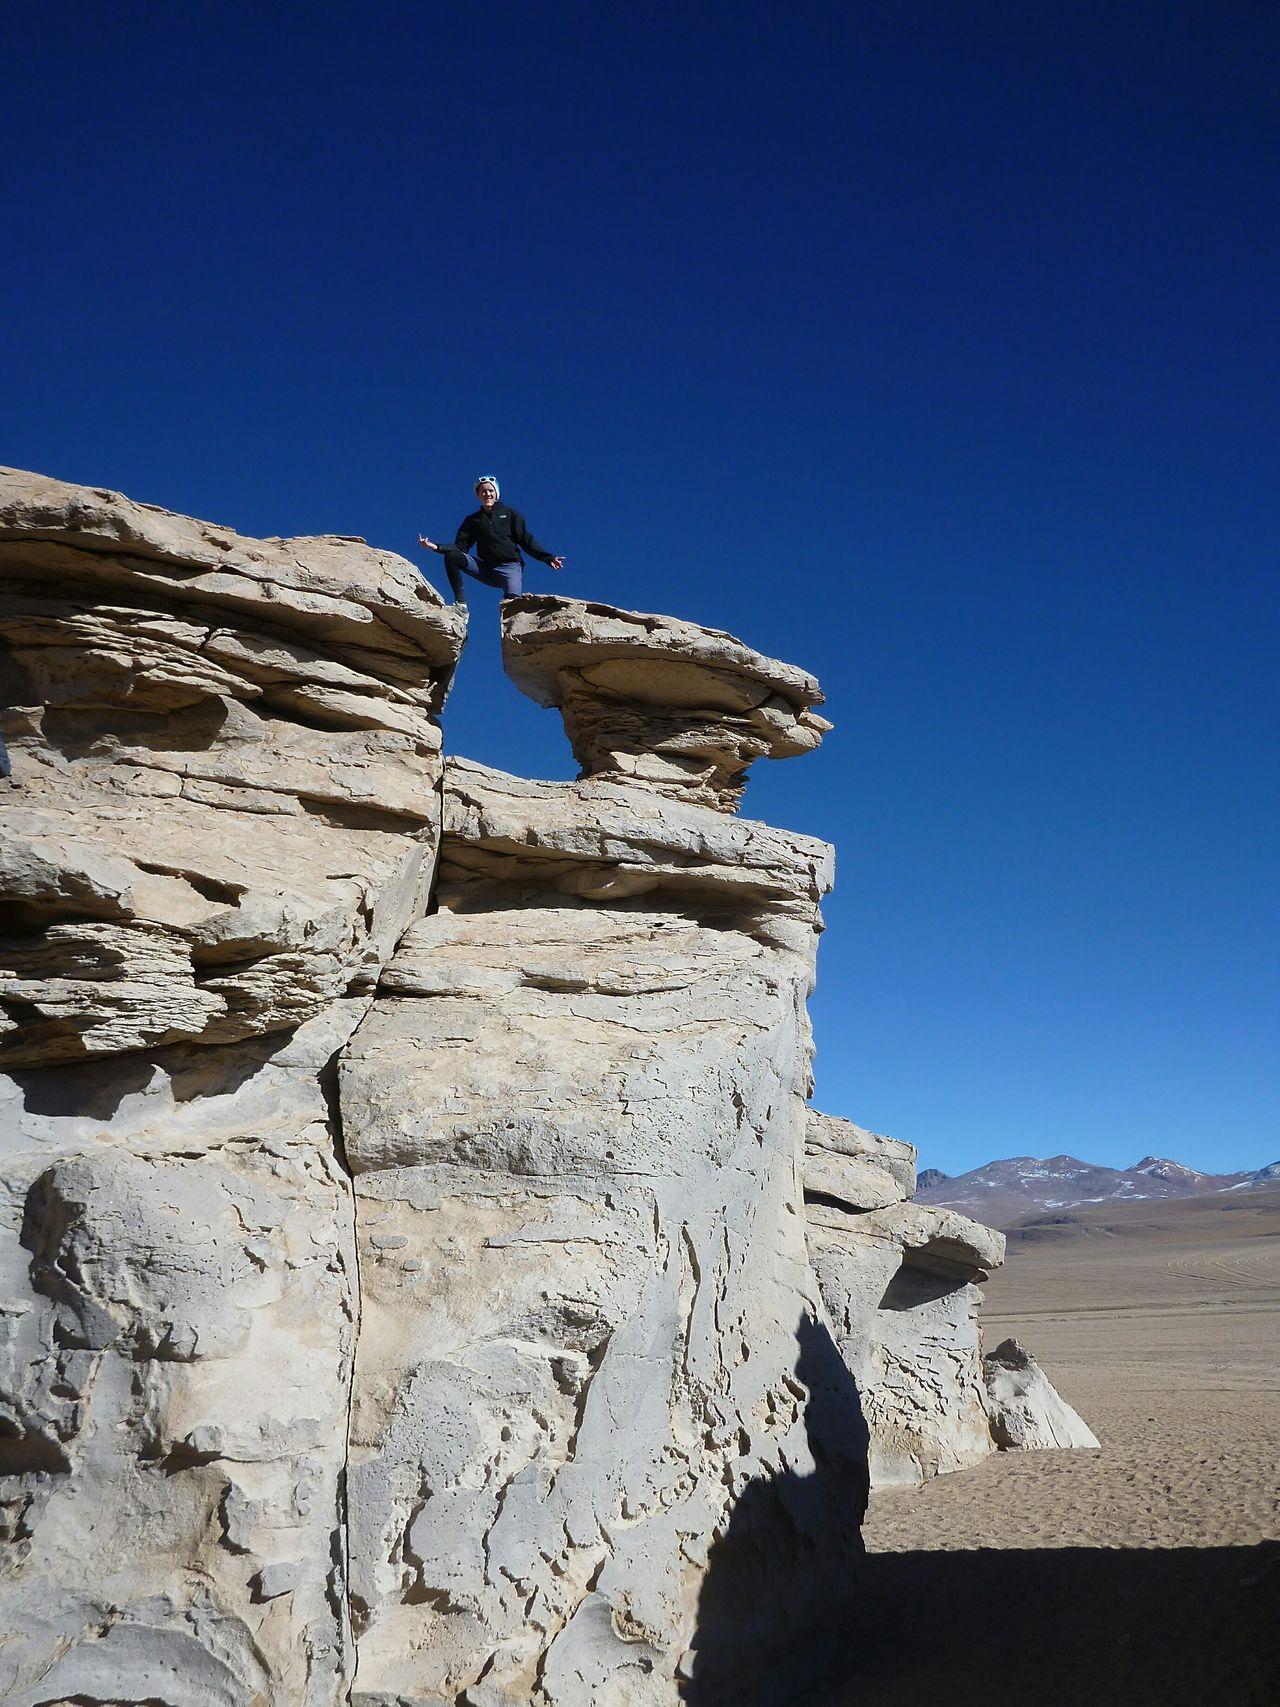 Adventure Club Salar De Uyuni Rocks Scrambling